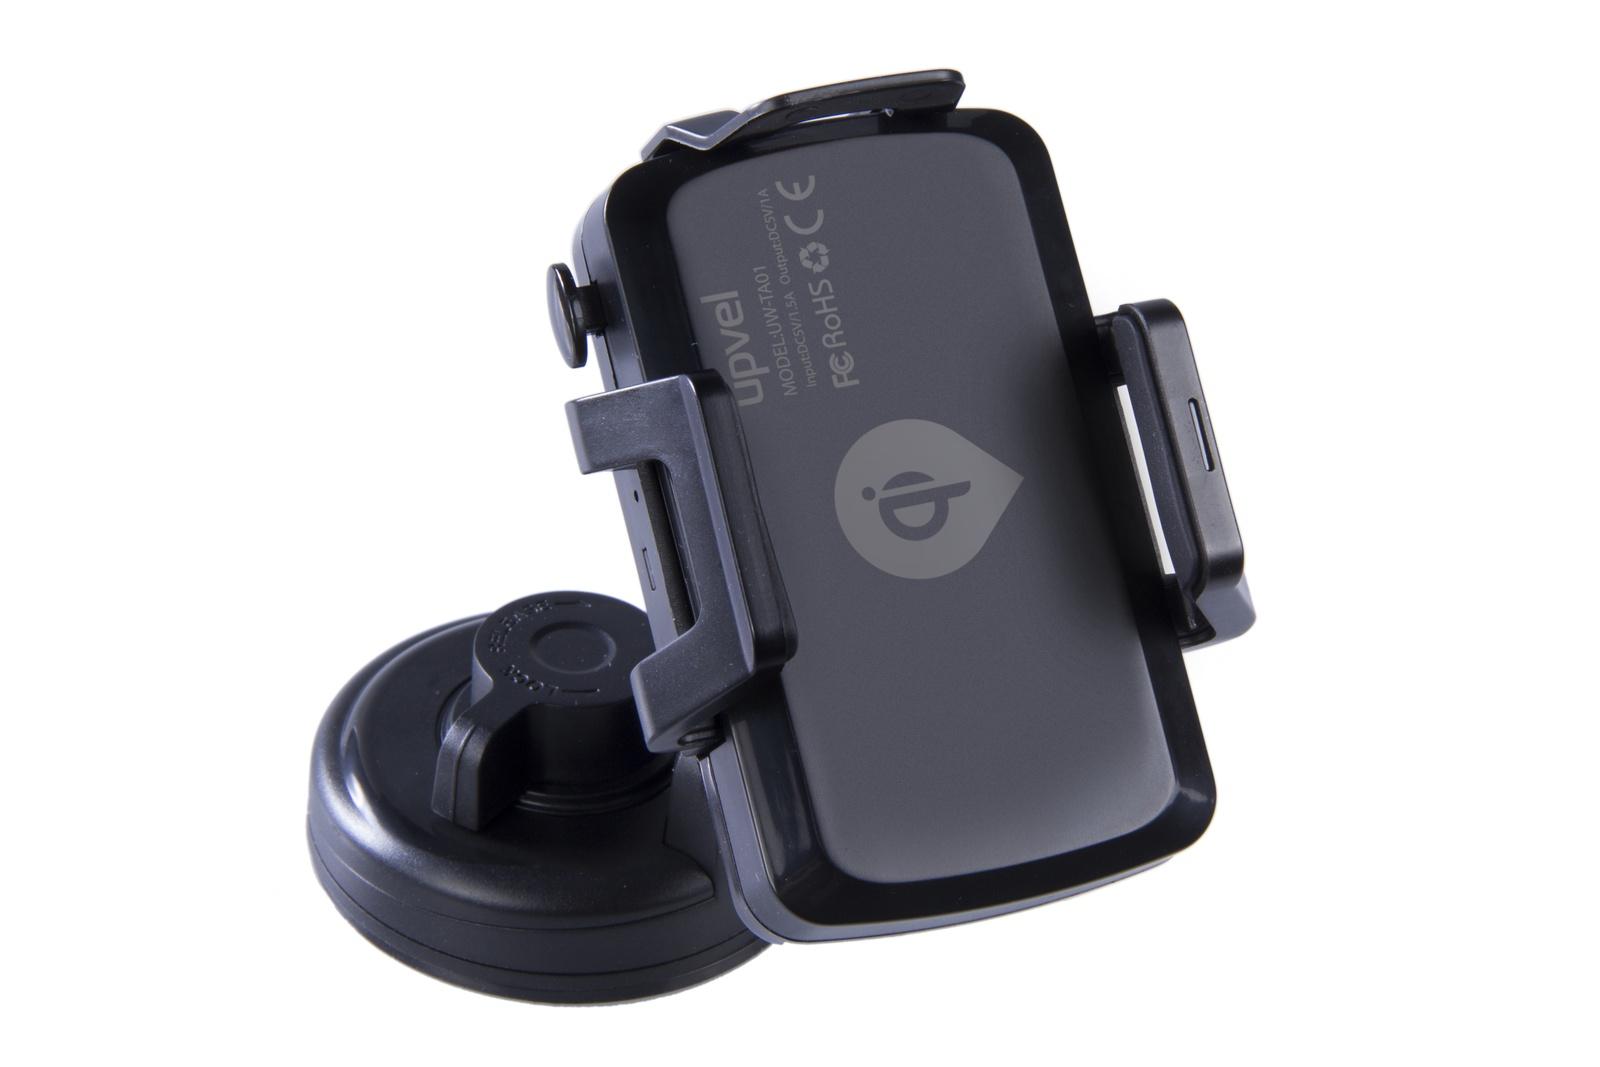 UPVEL UQ-TA01 Stingray, Black автомобильное беспроводное зарядное устройство стандарта Qi все цены